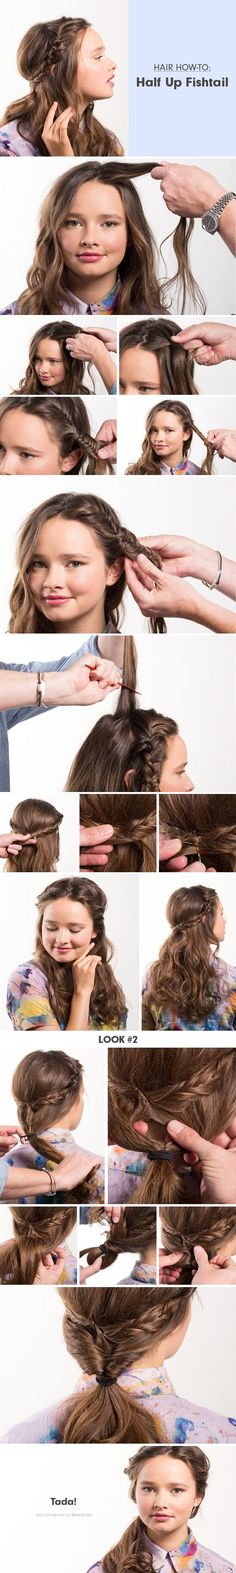 Hair How-To: Half-Up Fishtail http://www.beautylish.com/a/vxgwq/half-up-fishtail-braid